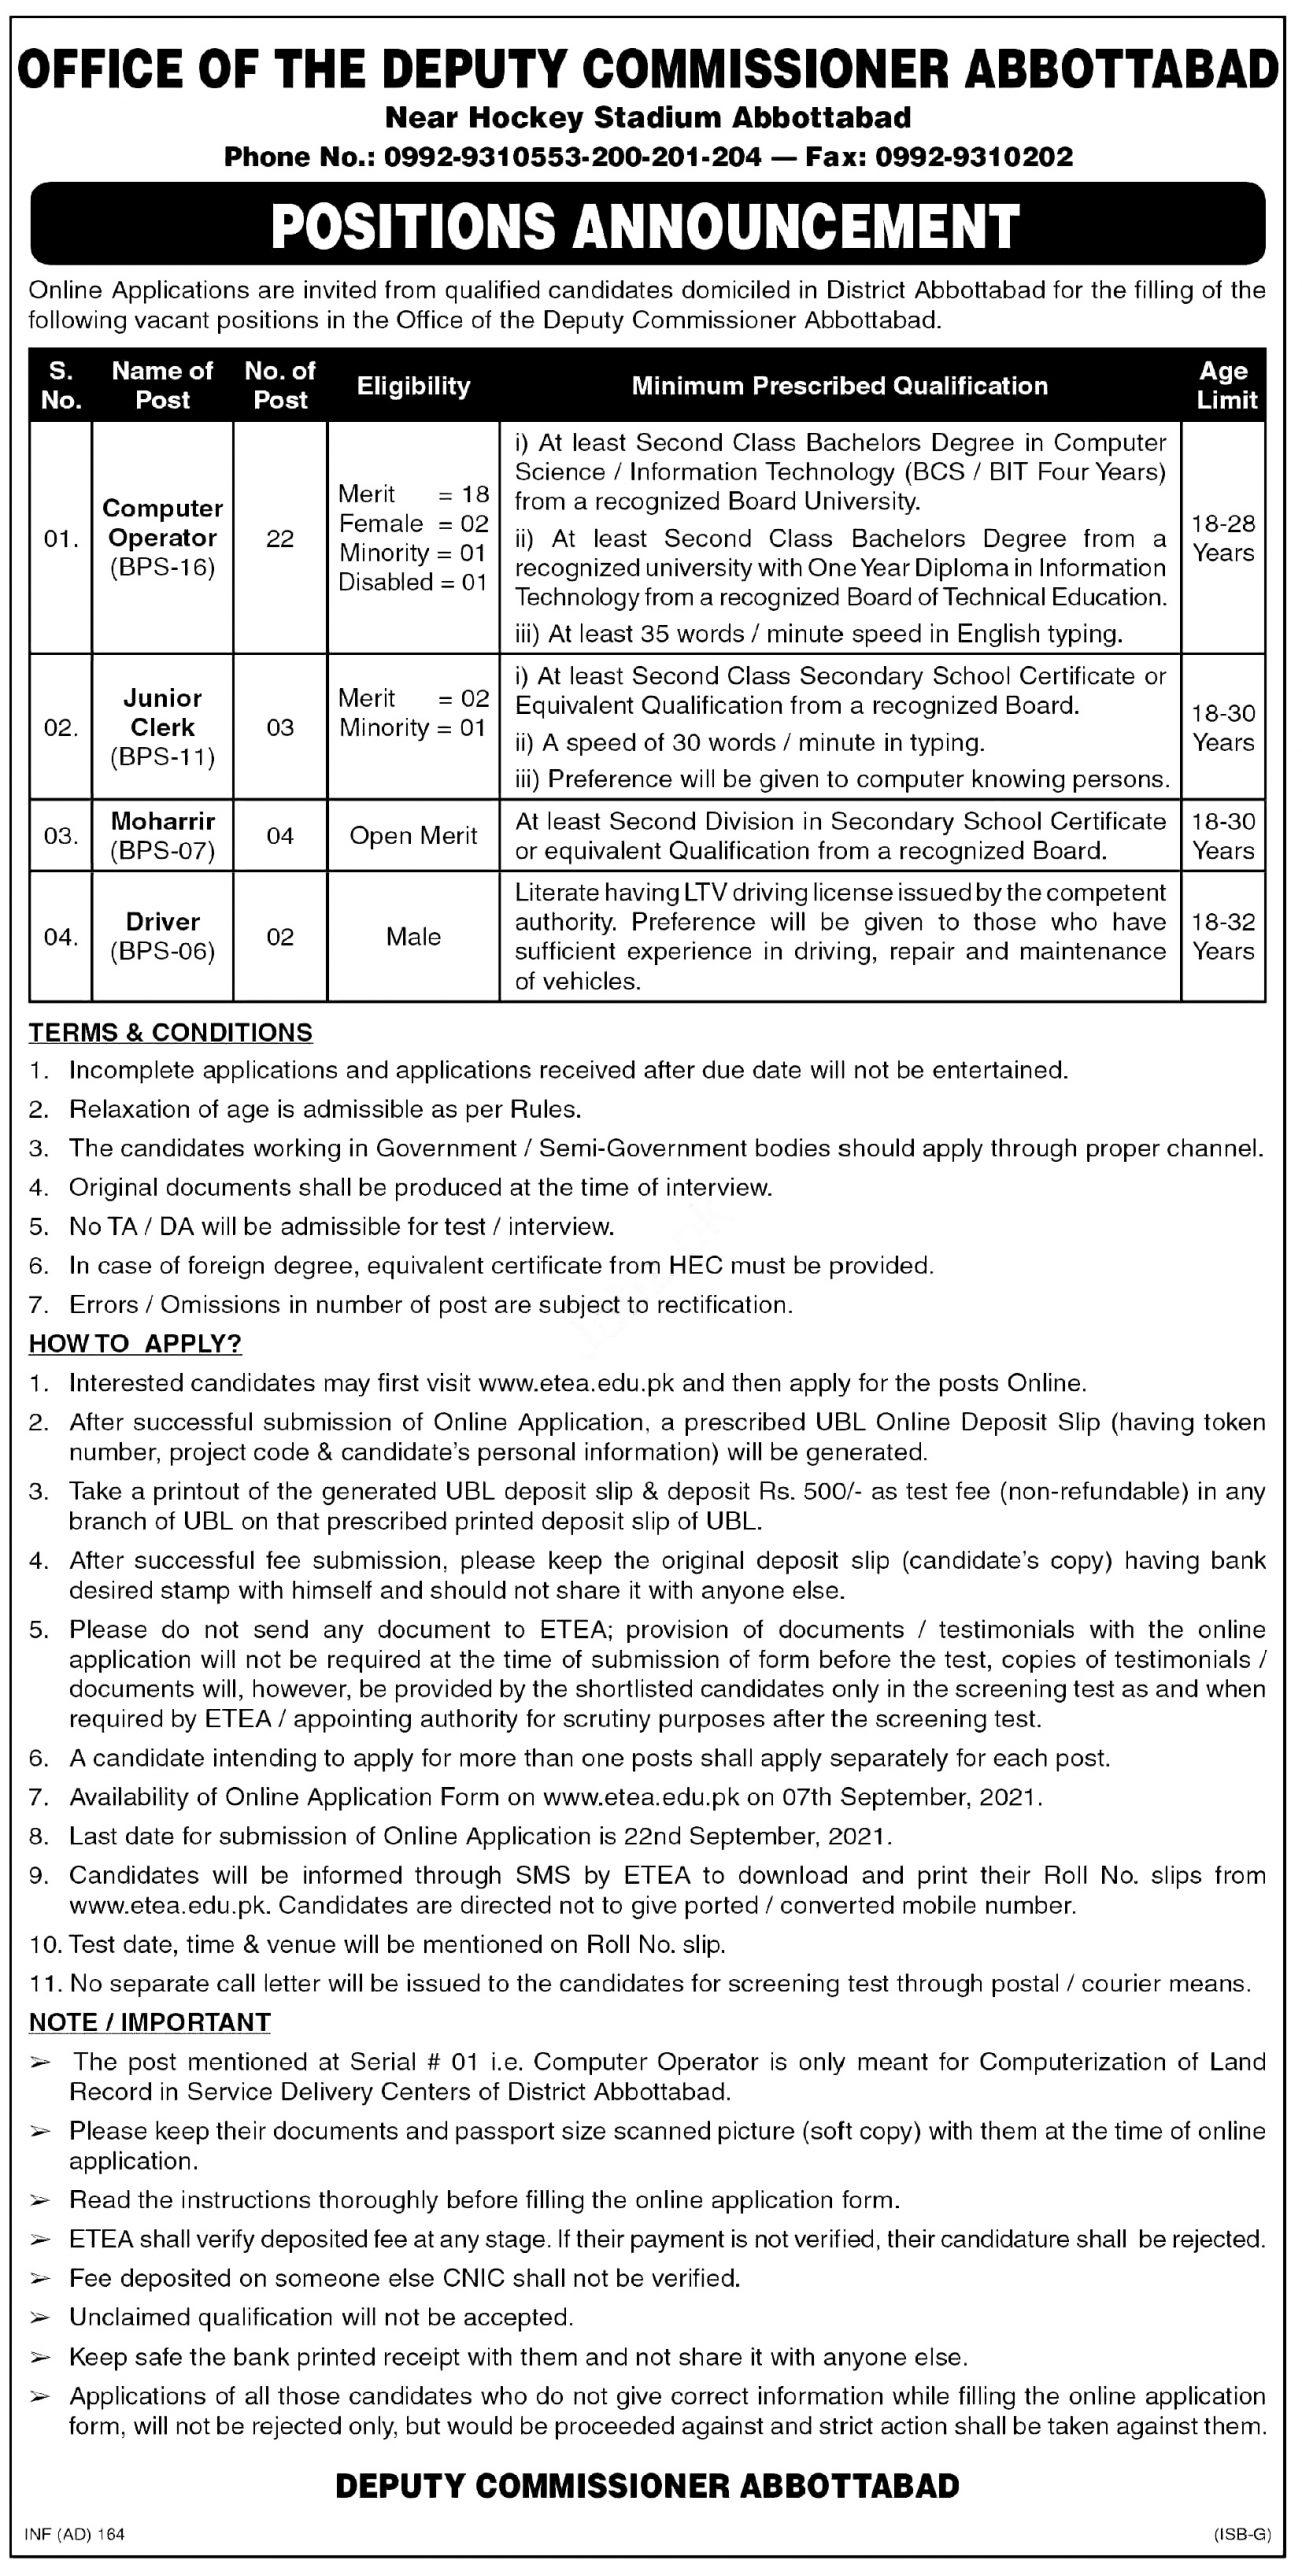 Deputy Commissioner Abbottabad ETEA Jobs Apply Online